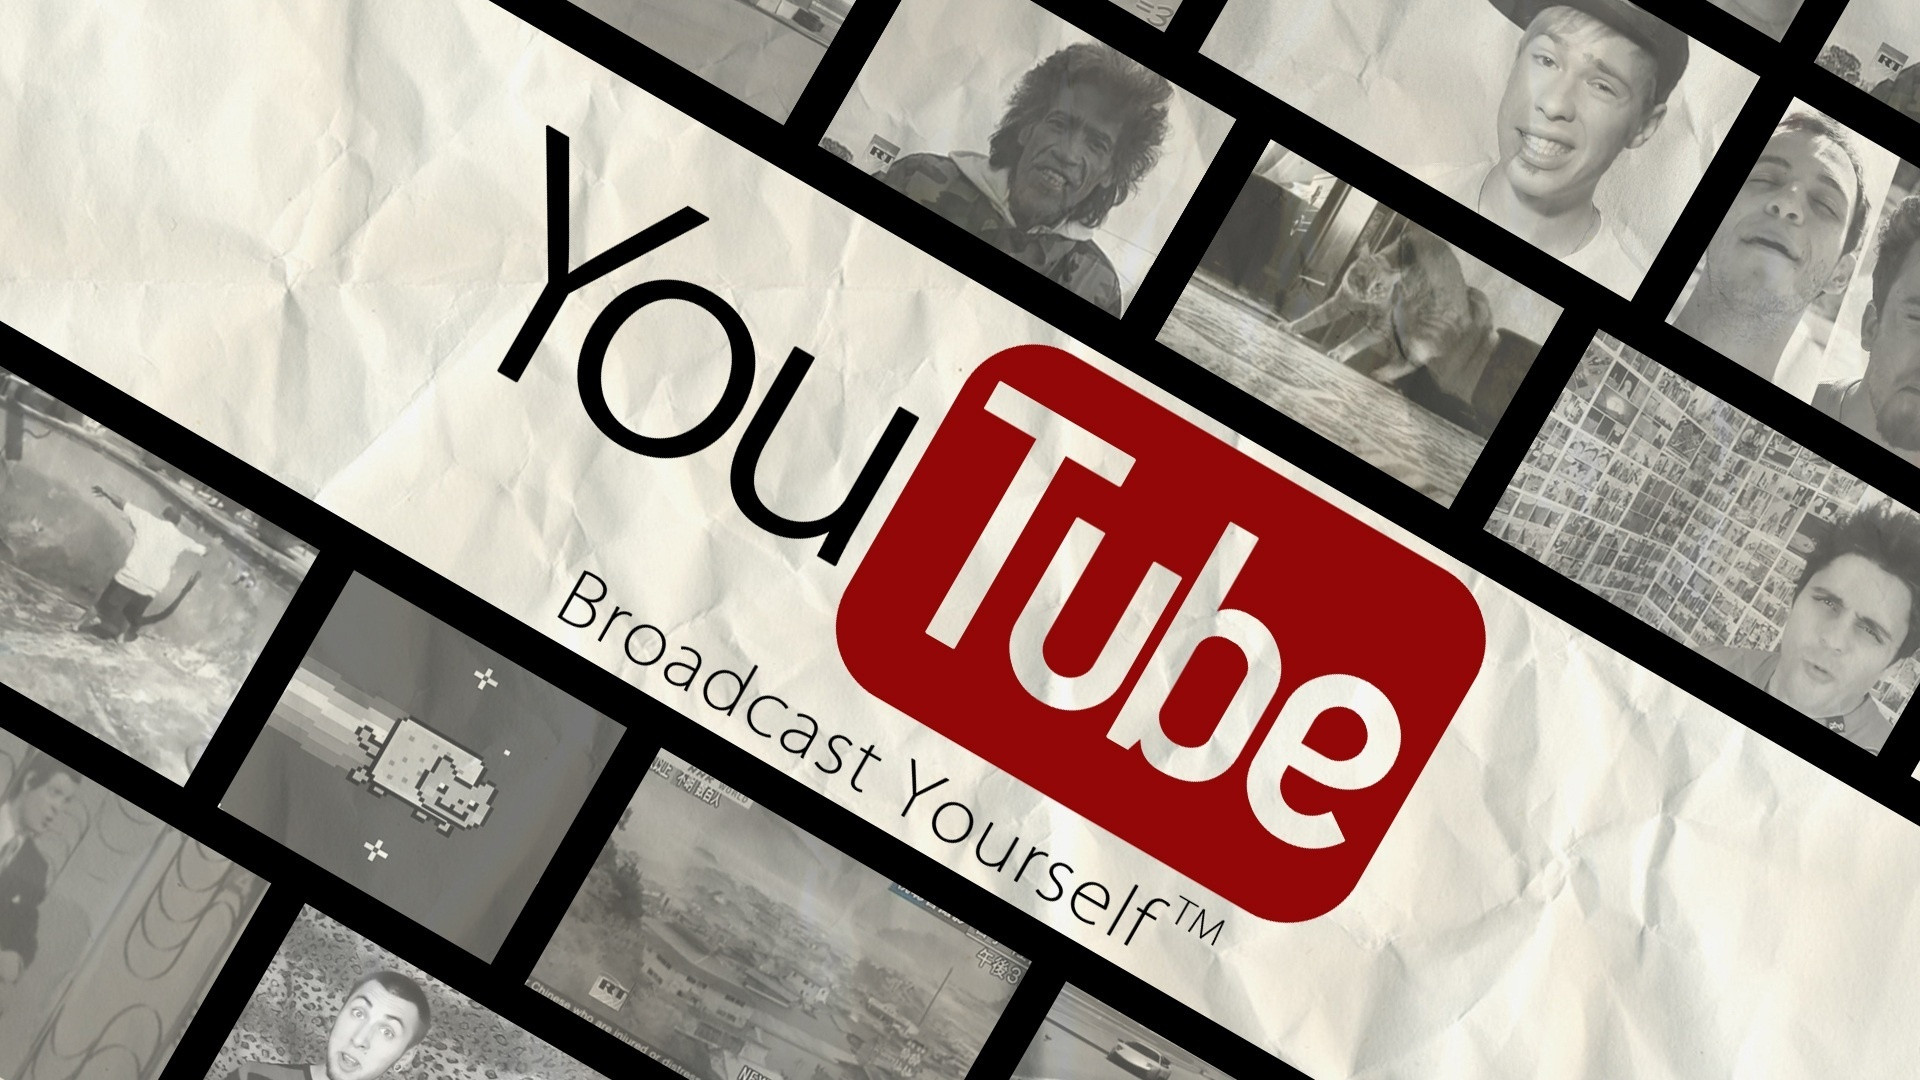 Youtube experimentuje se vzhledem